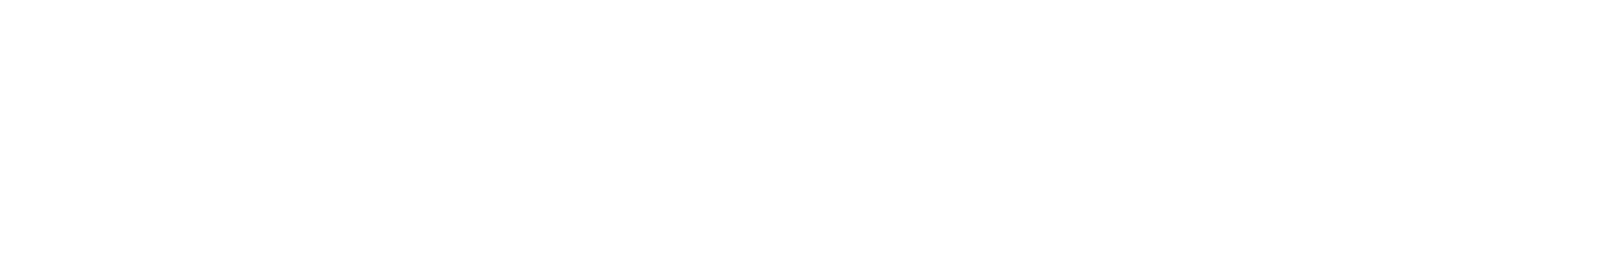 Scout hookup webbplats